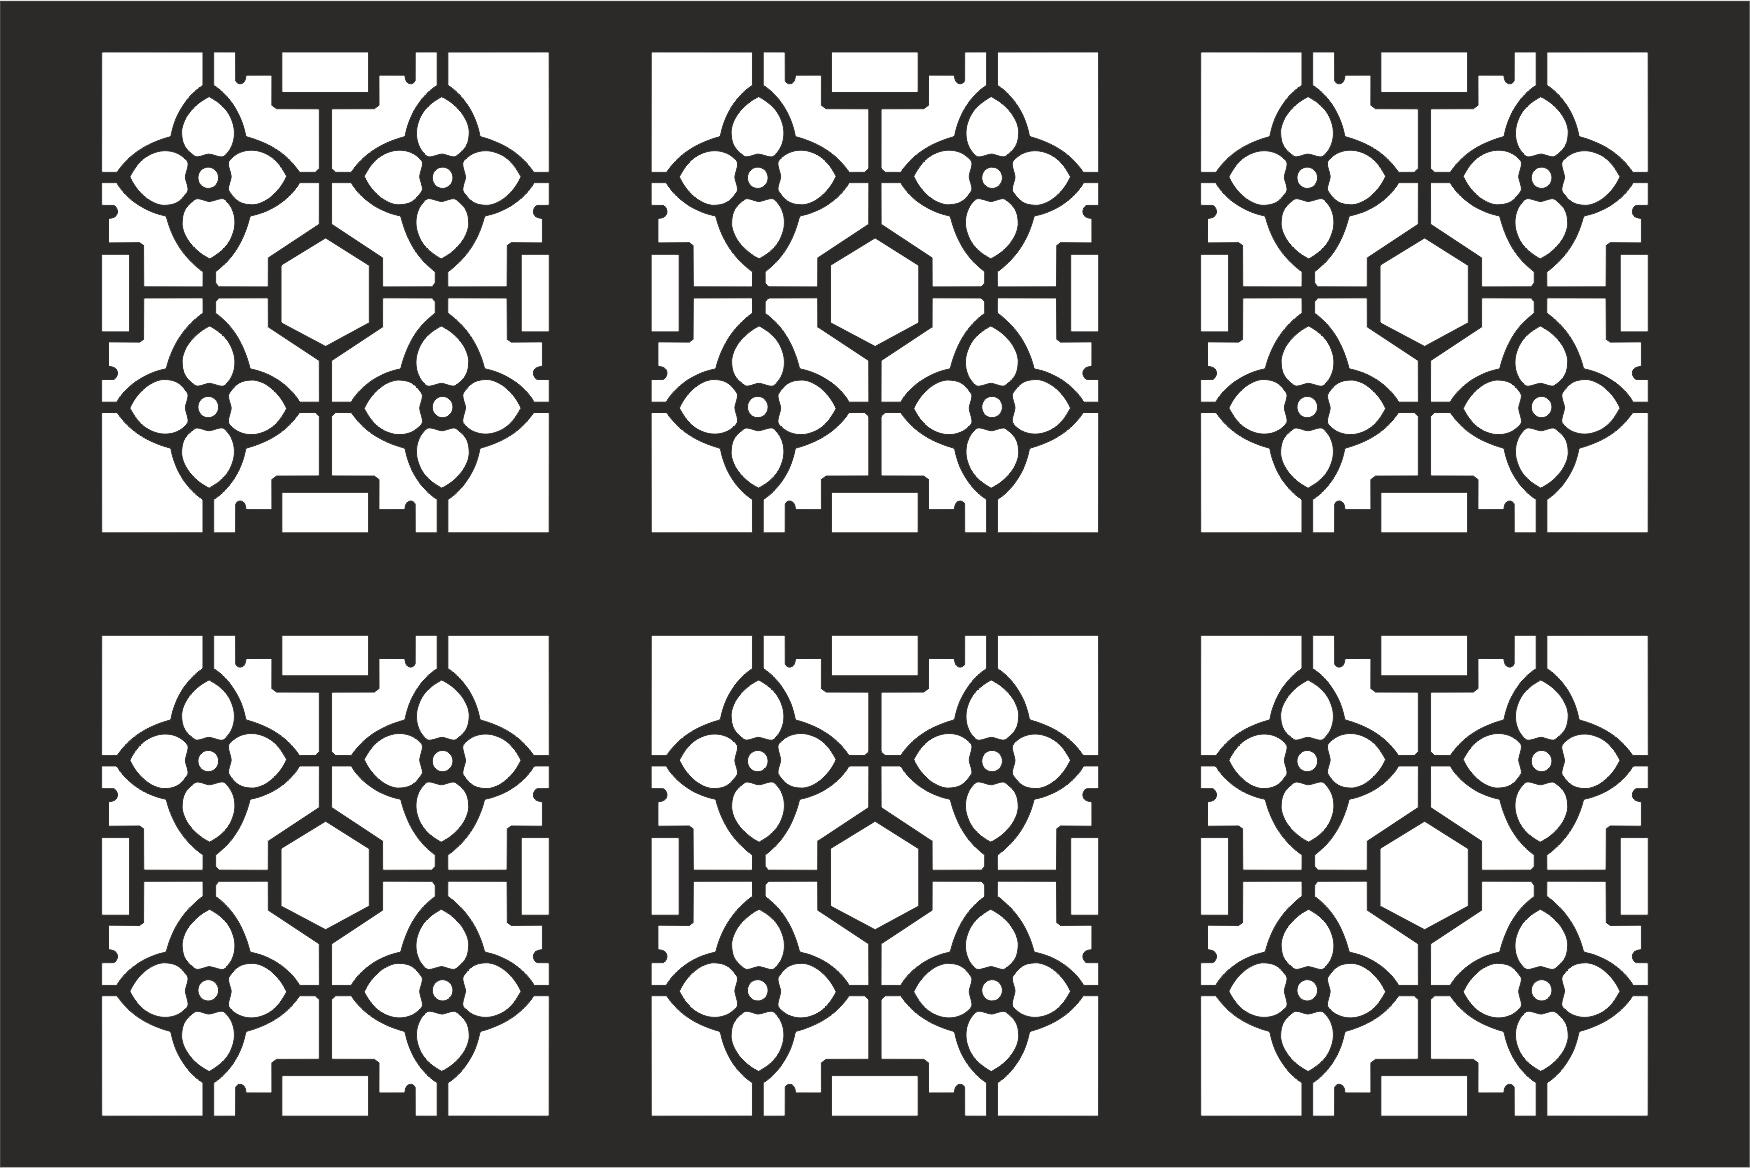 Decorative Grille Pattern Free CDR Vectors Art